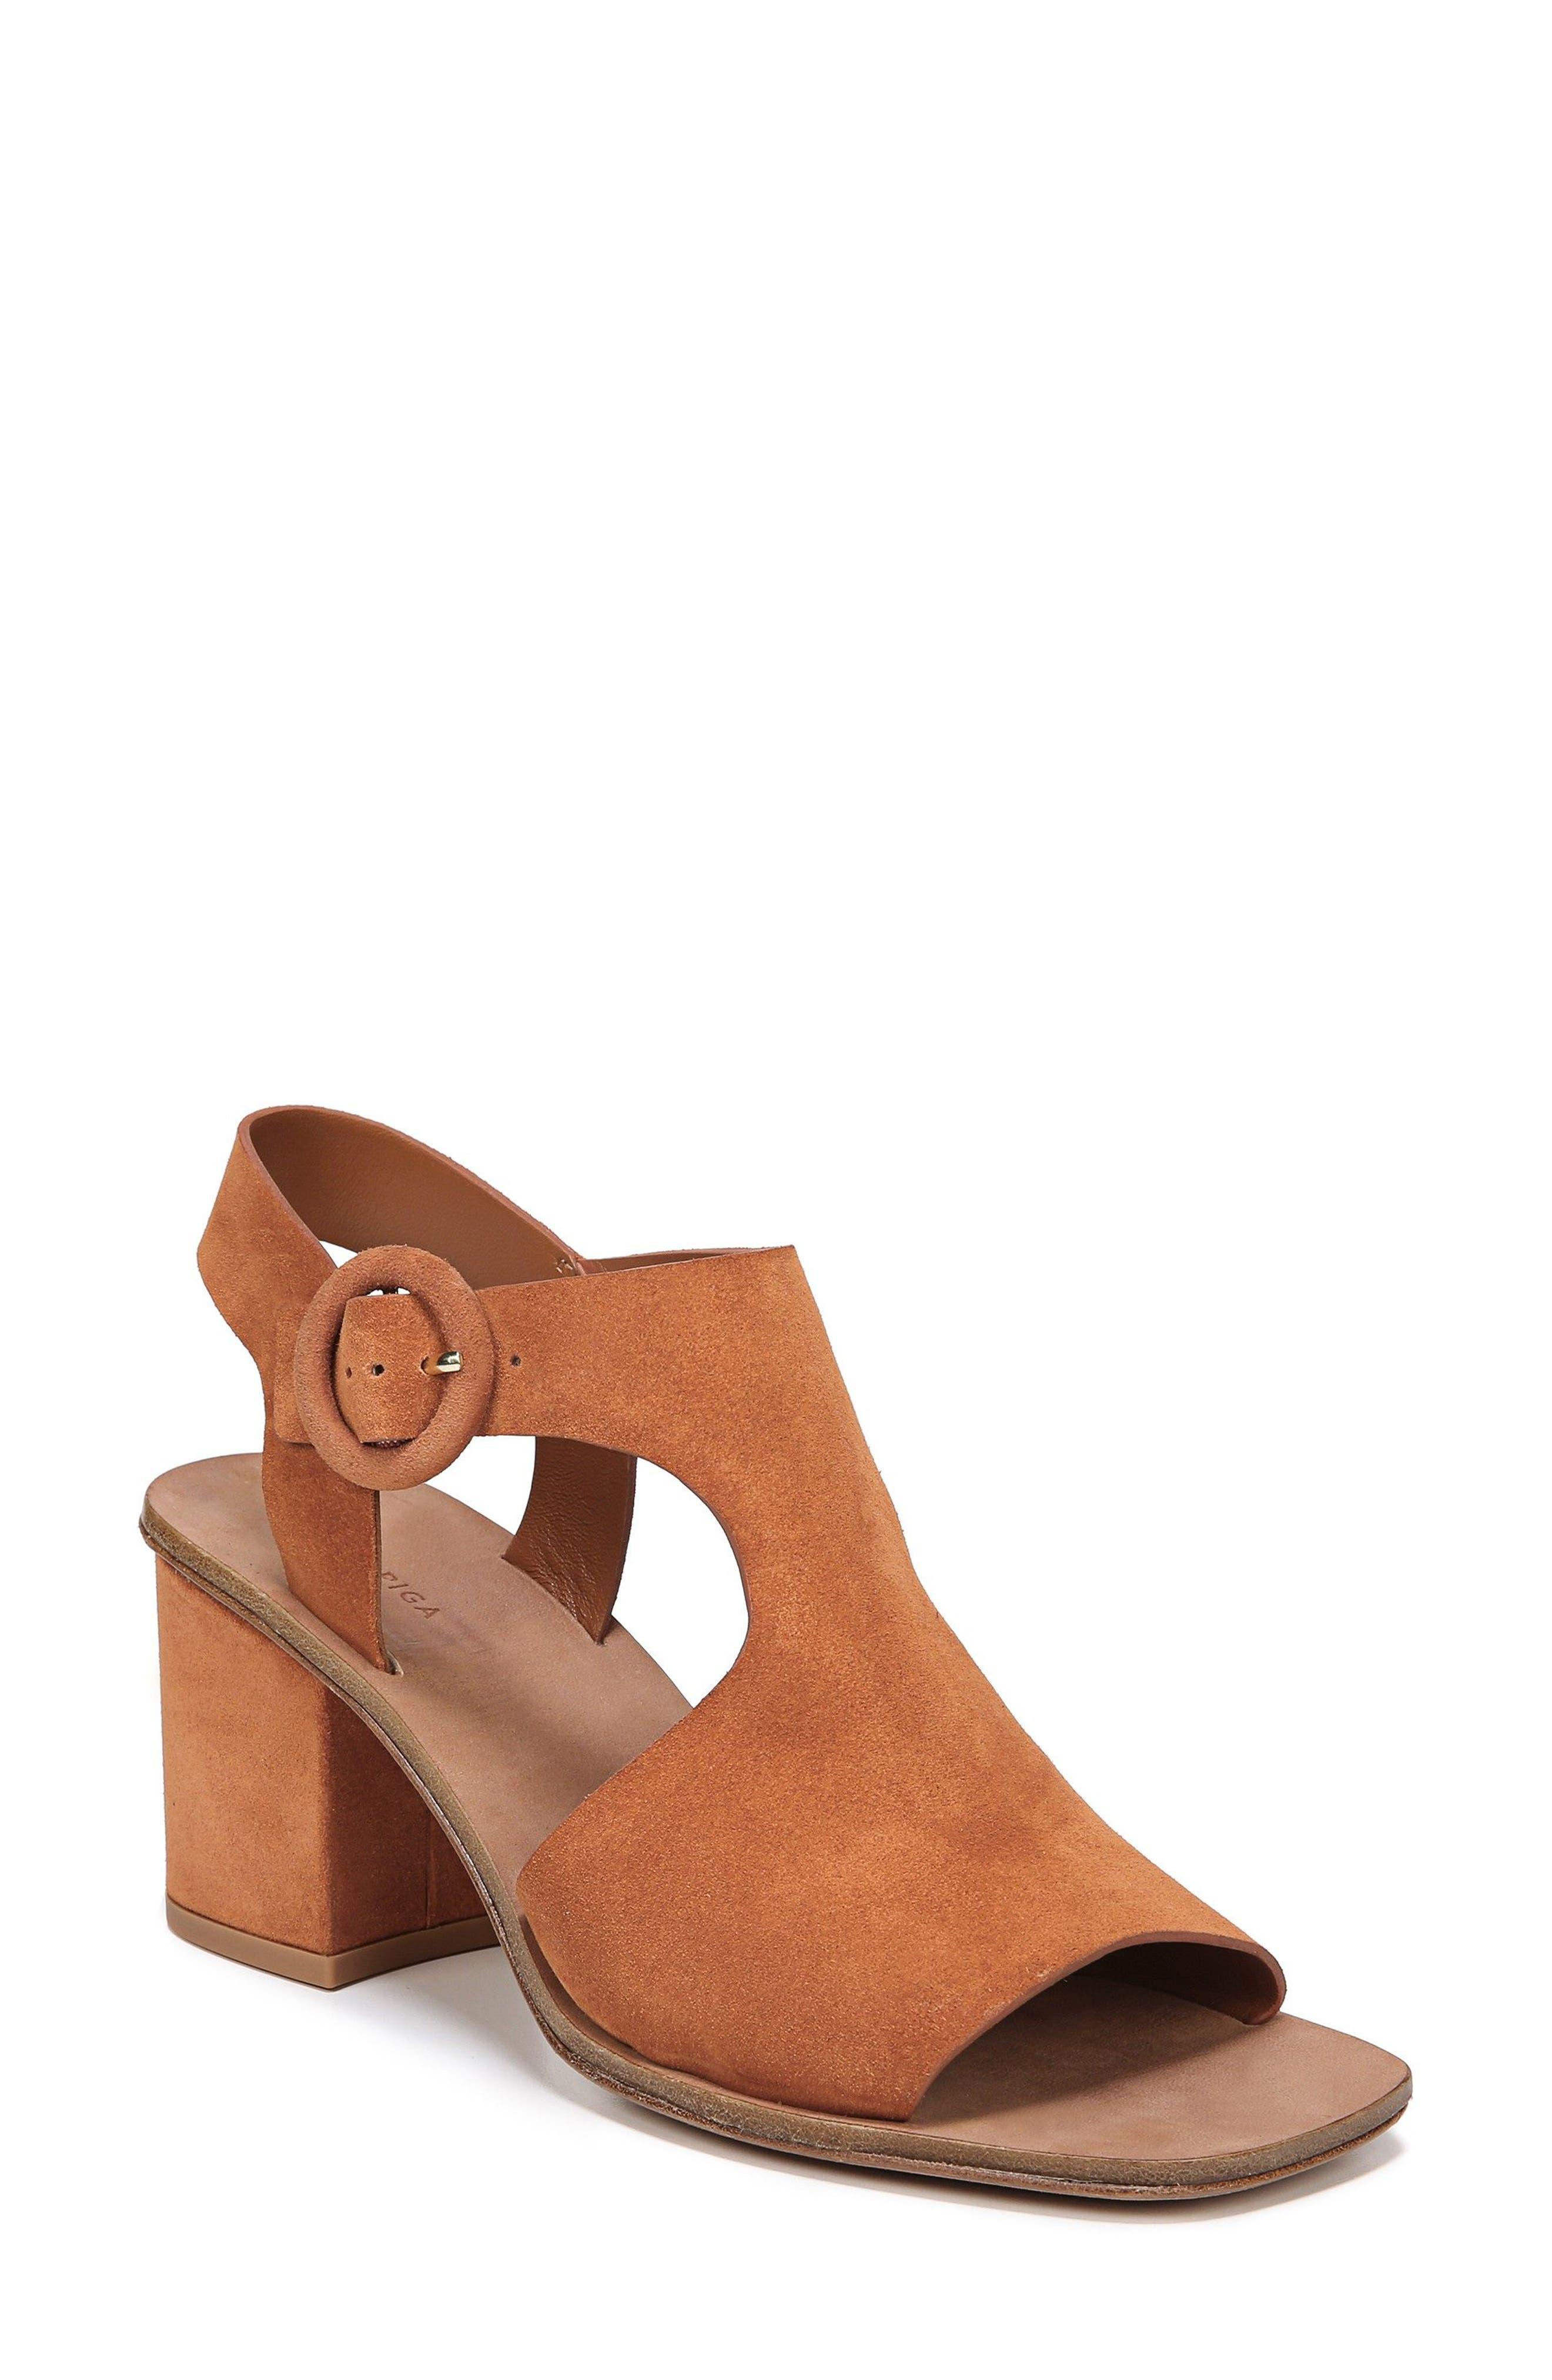 Katya Shield Sandal,                         Main,                         color, Amber Suede